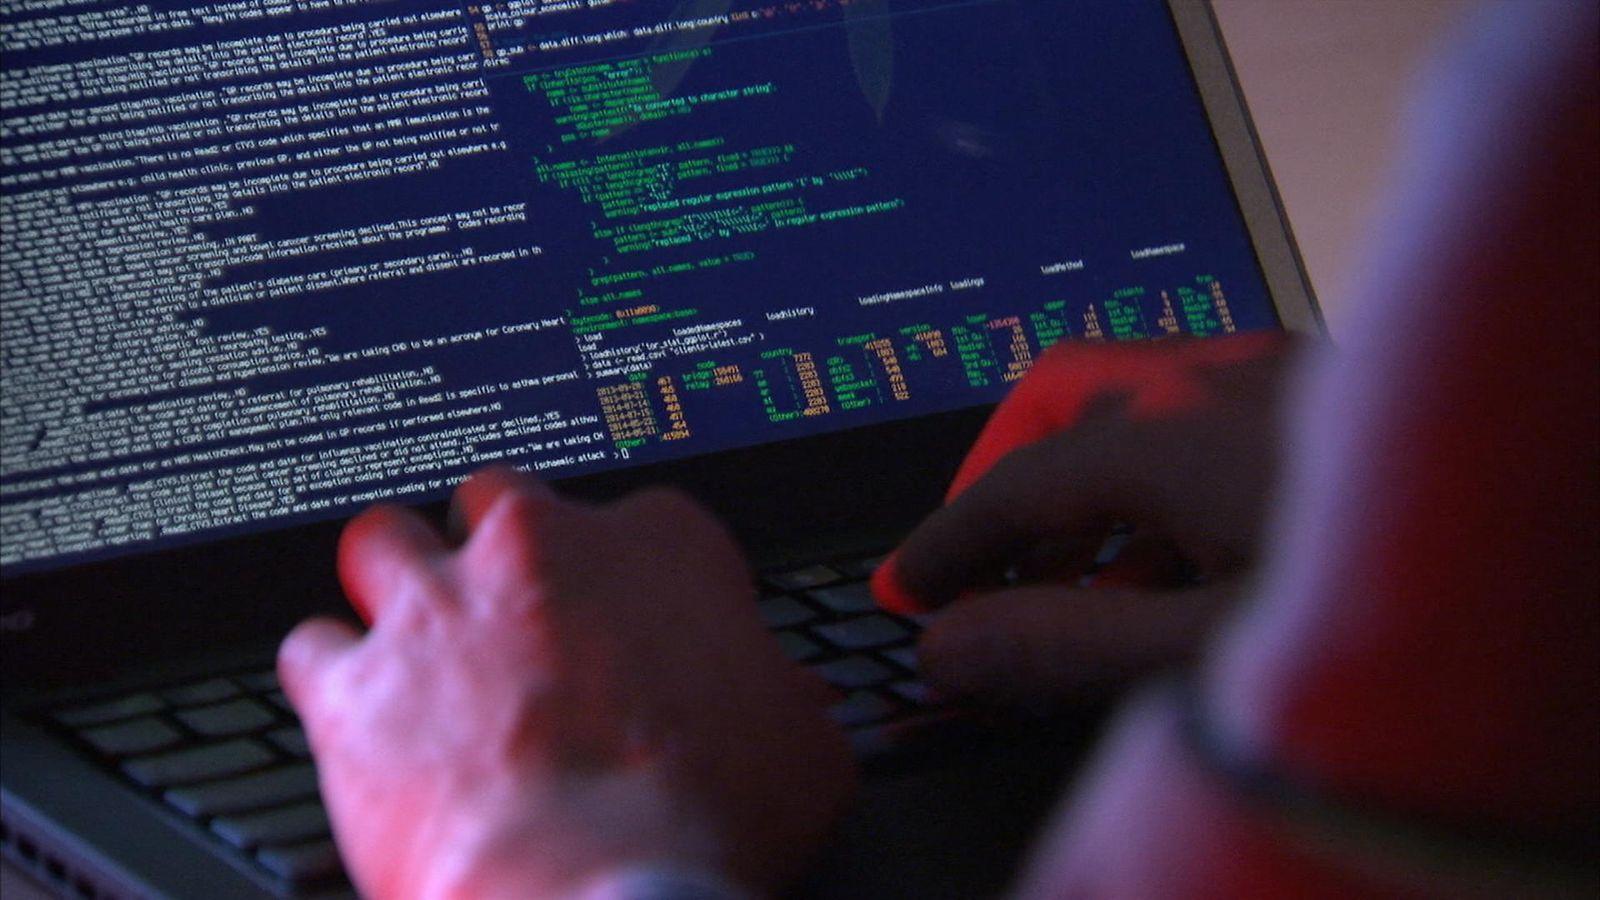 UK mass surveillance violated human rights, court rules